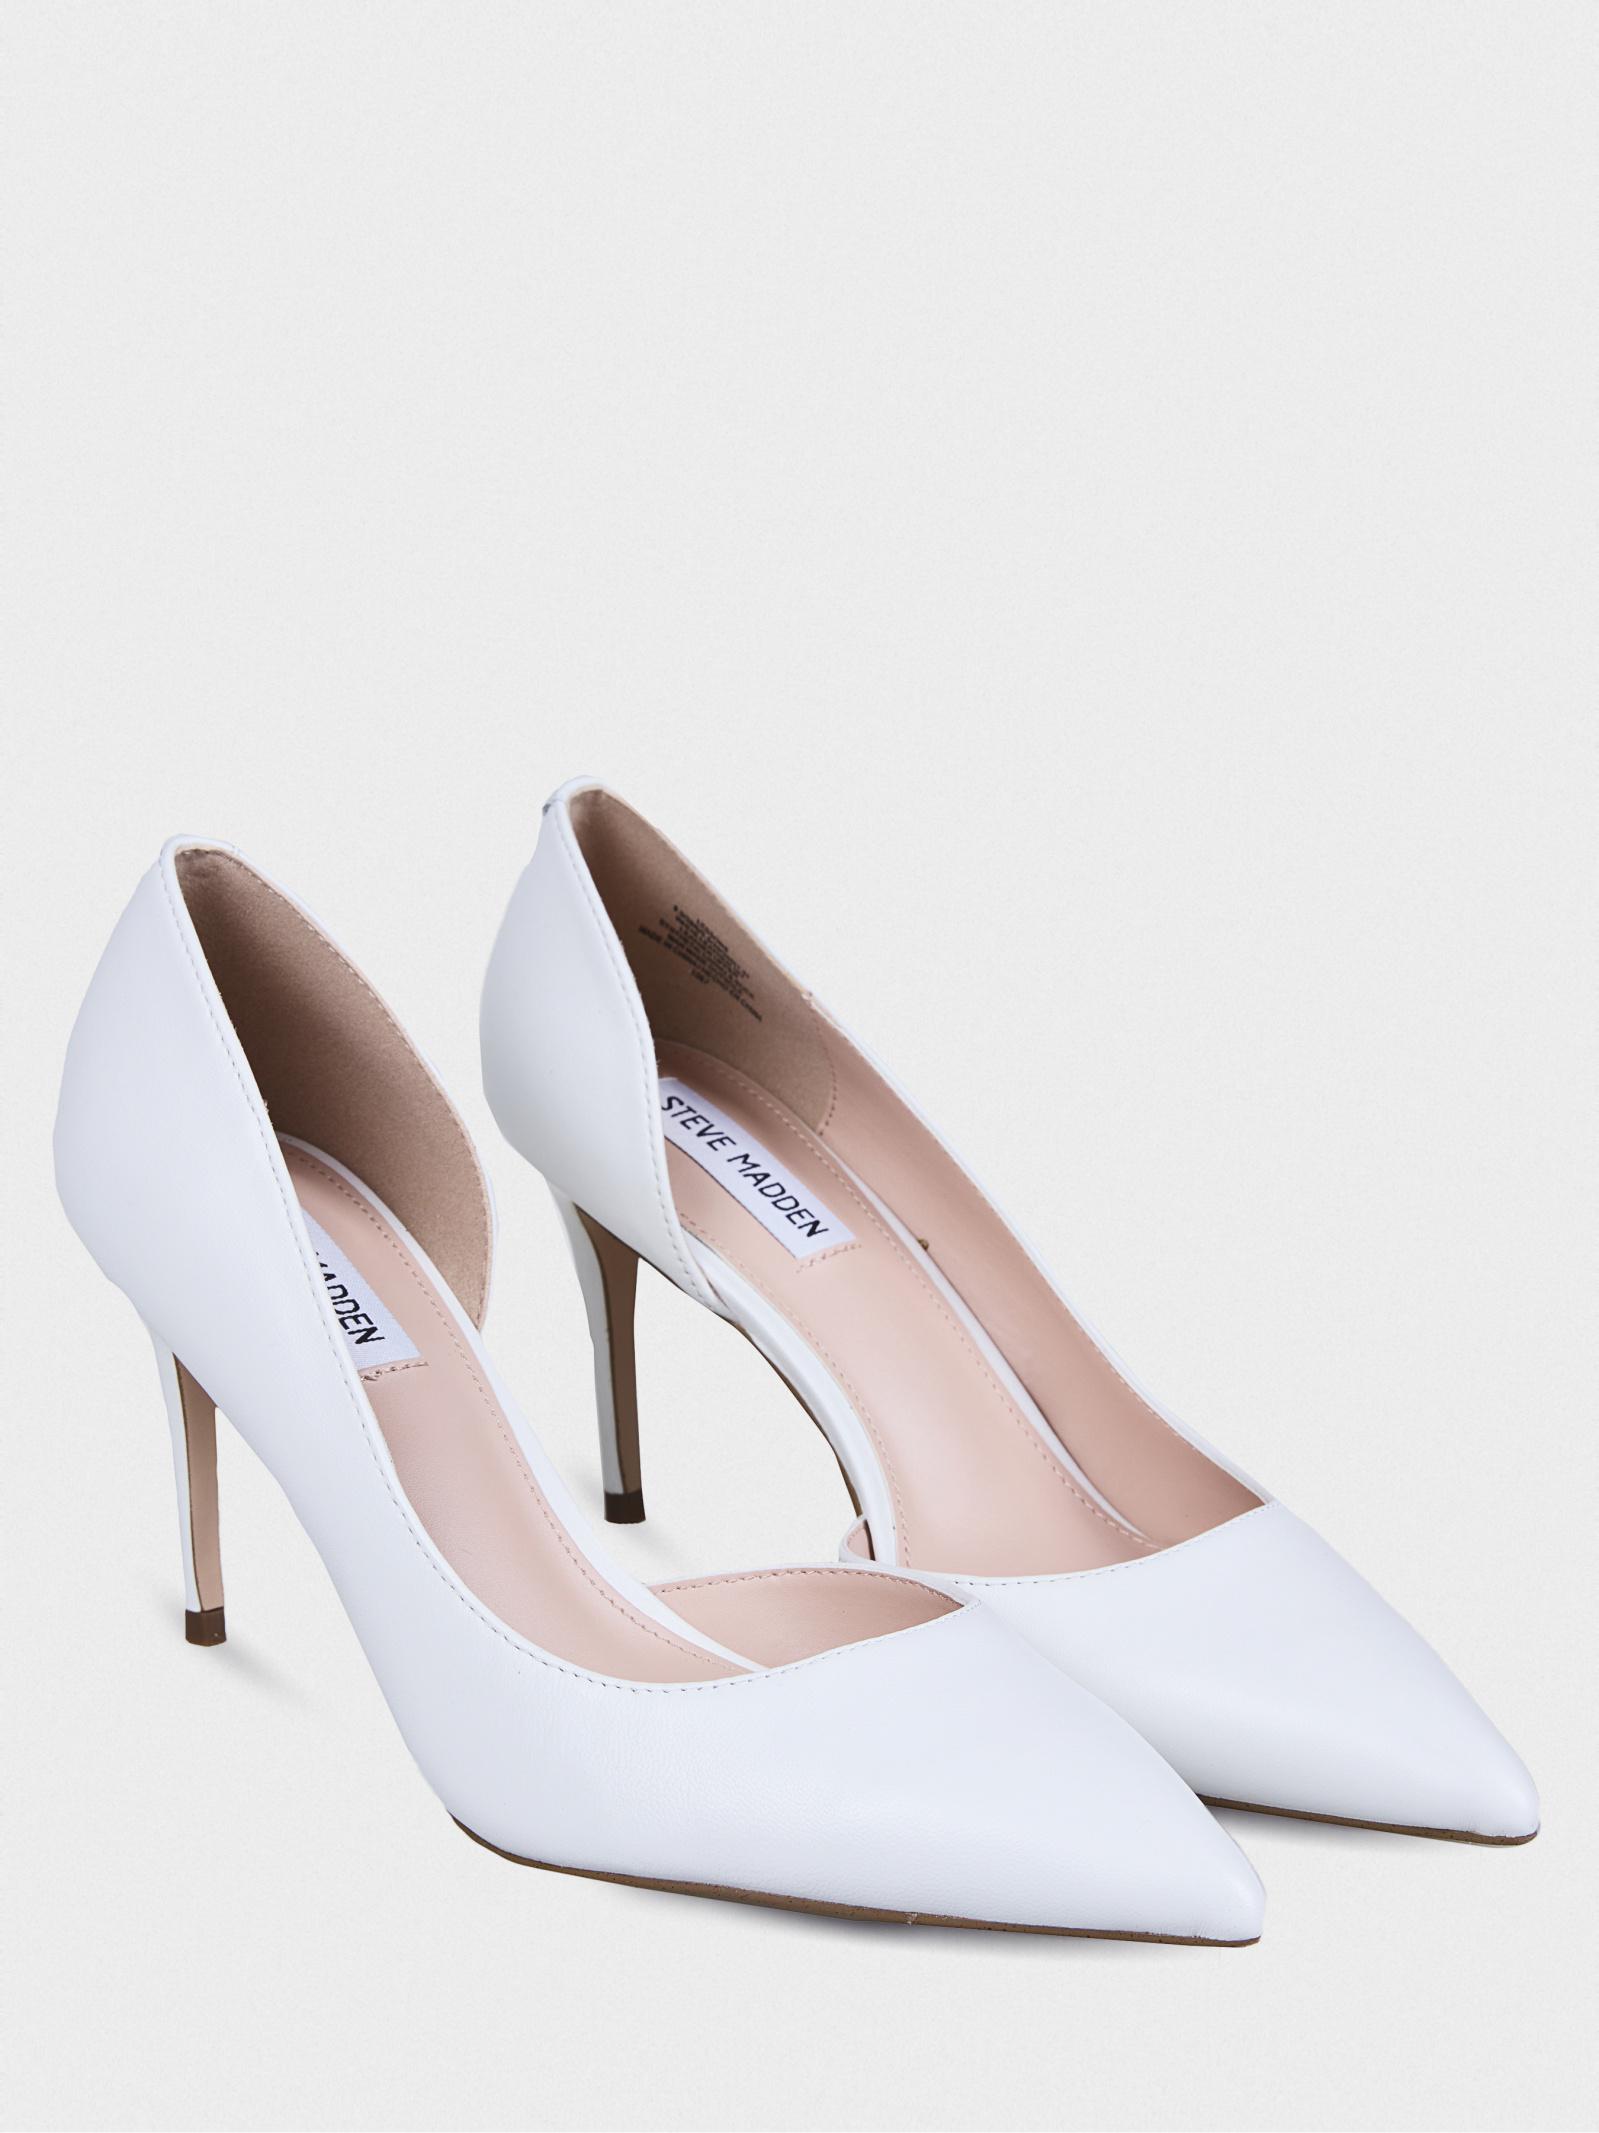 Туфли женские Steve Madden LESSONS SM11000961 WHITE LEATHER купить в Интертоп, 2017